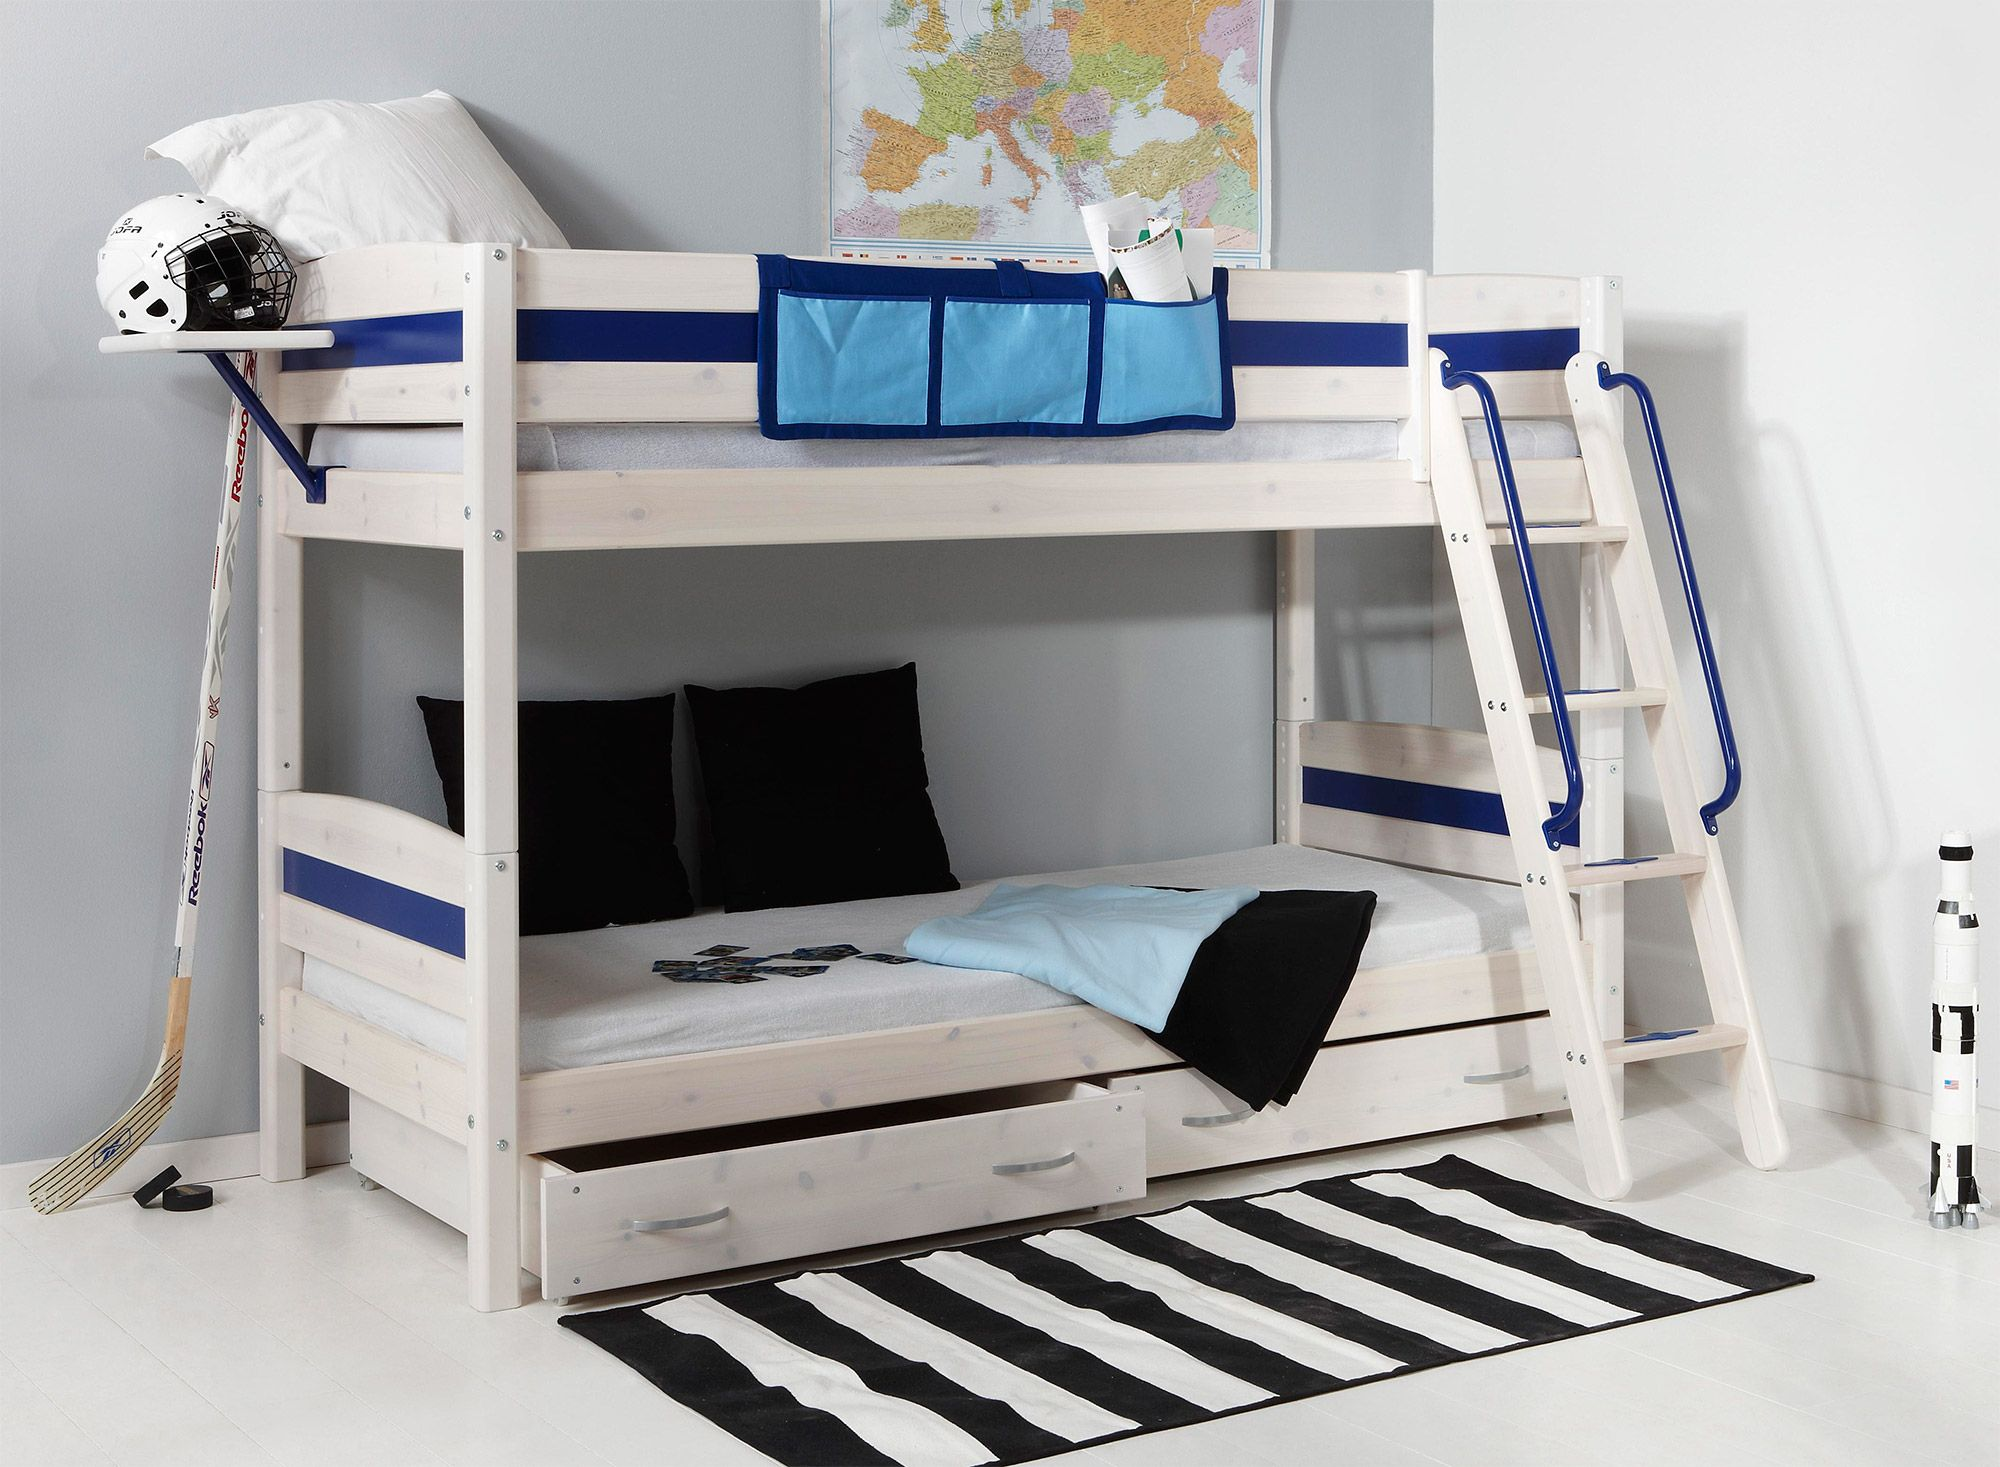 Thuka Trendy Bunk Bed B